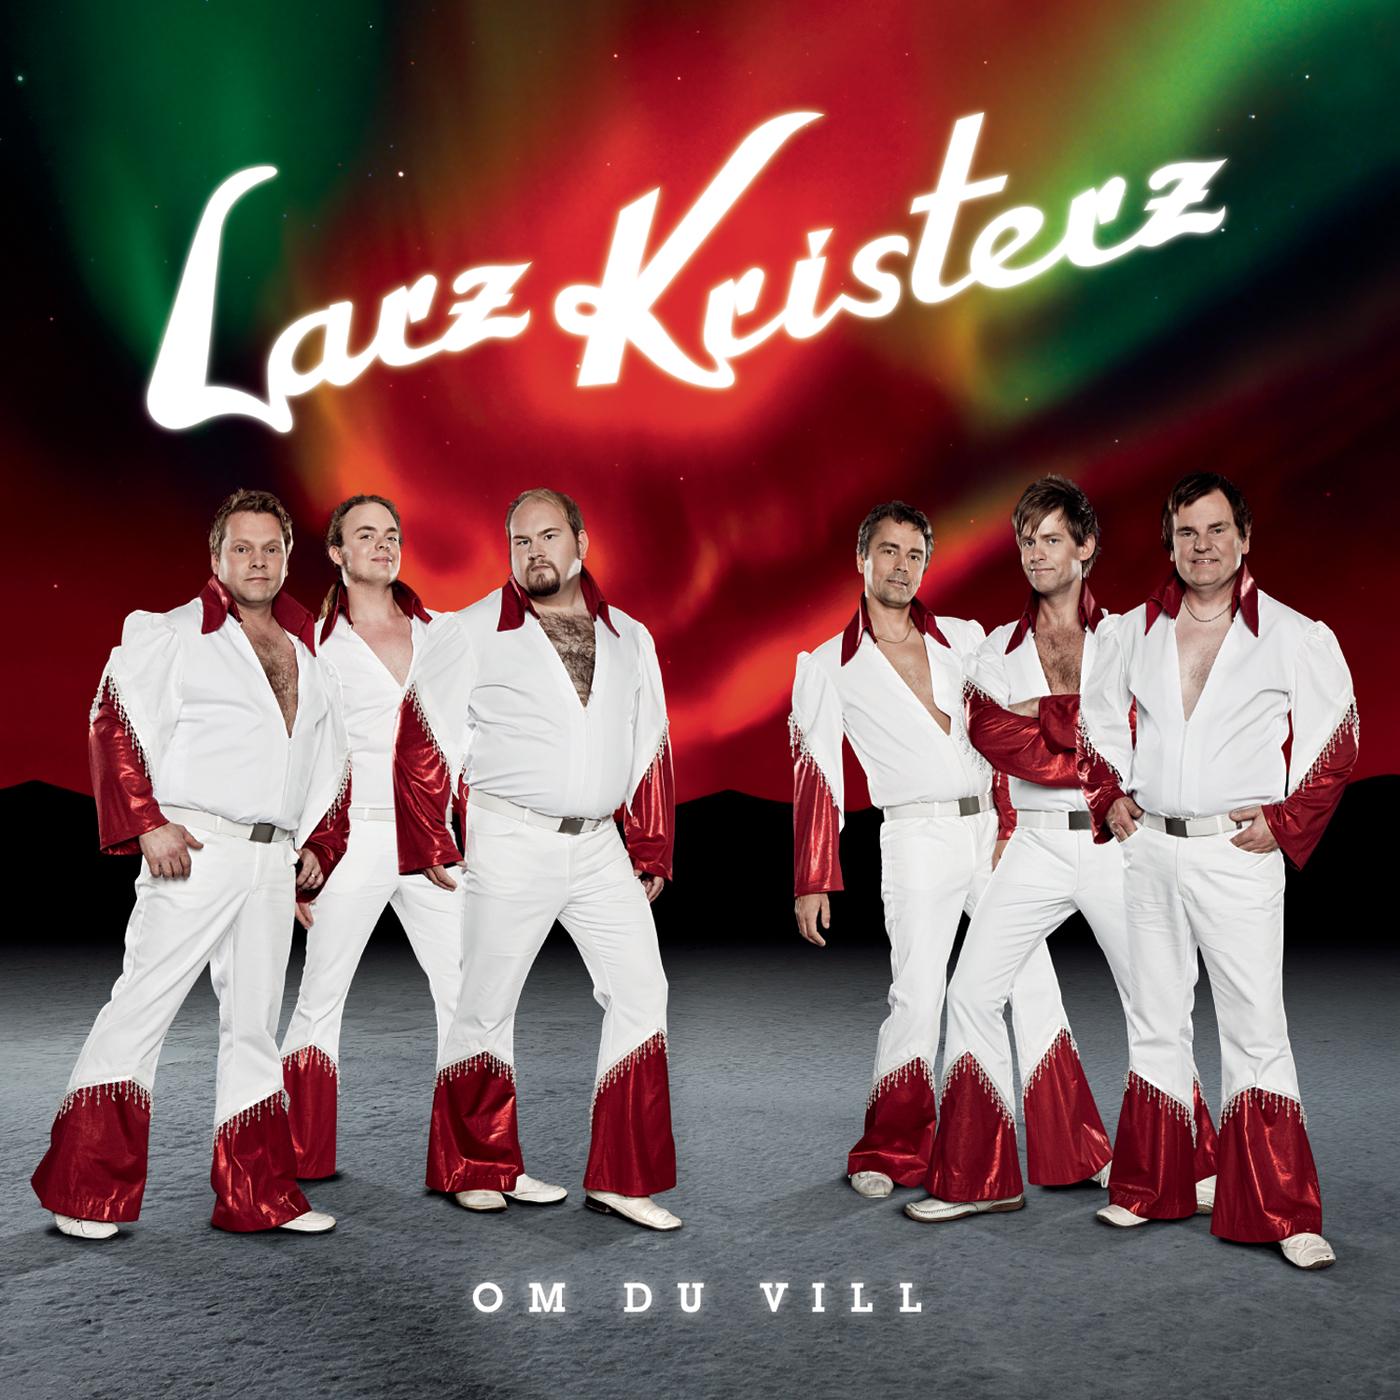 Om du vill - Larz-Kristerz